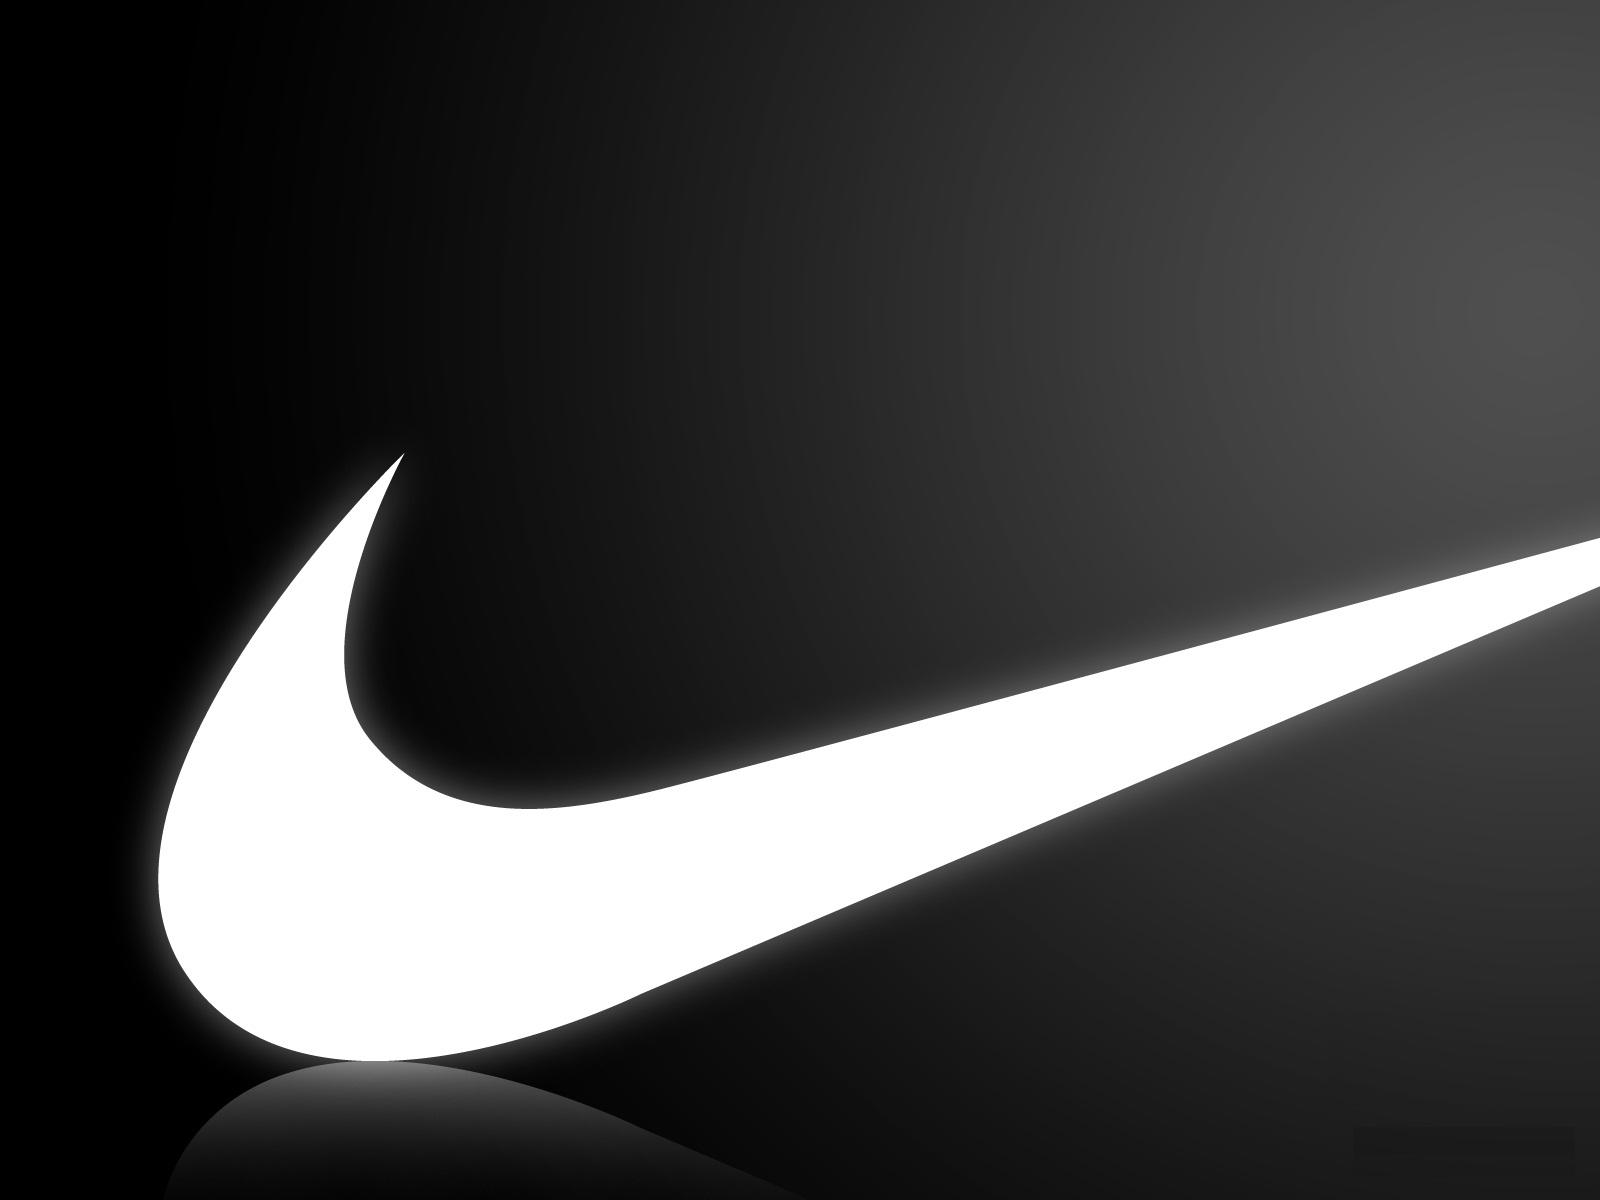 Nike Wallpaper Backgrounds 1600x1200